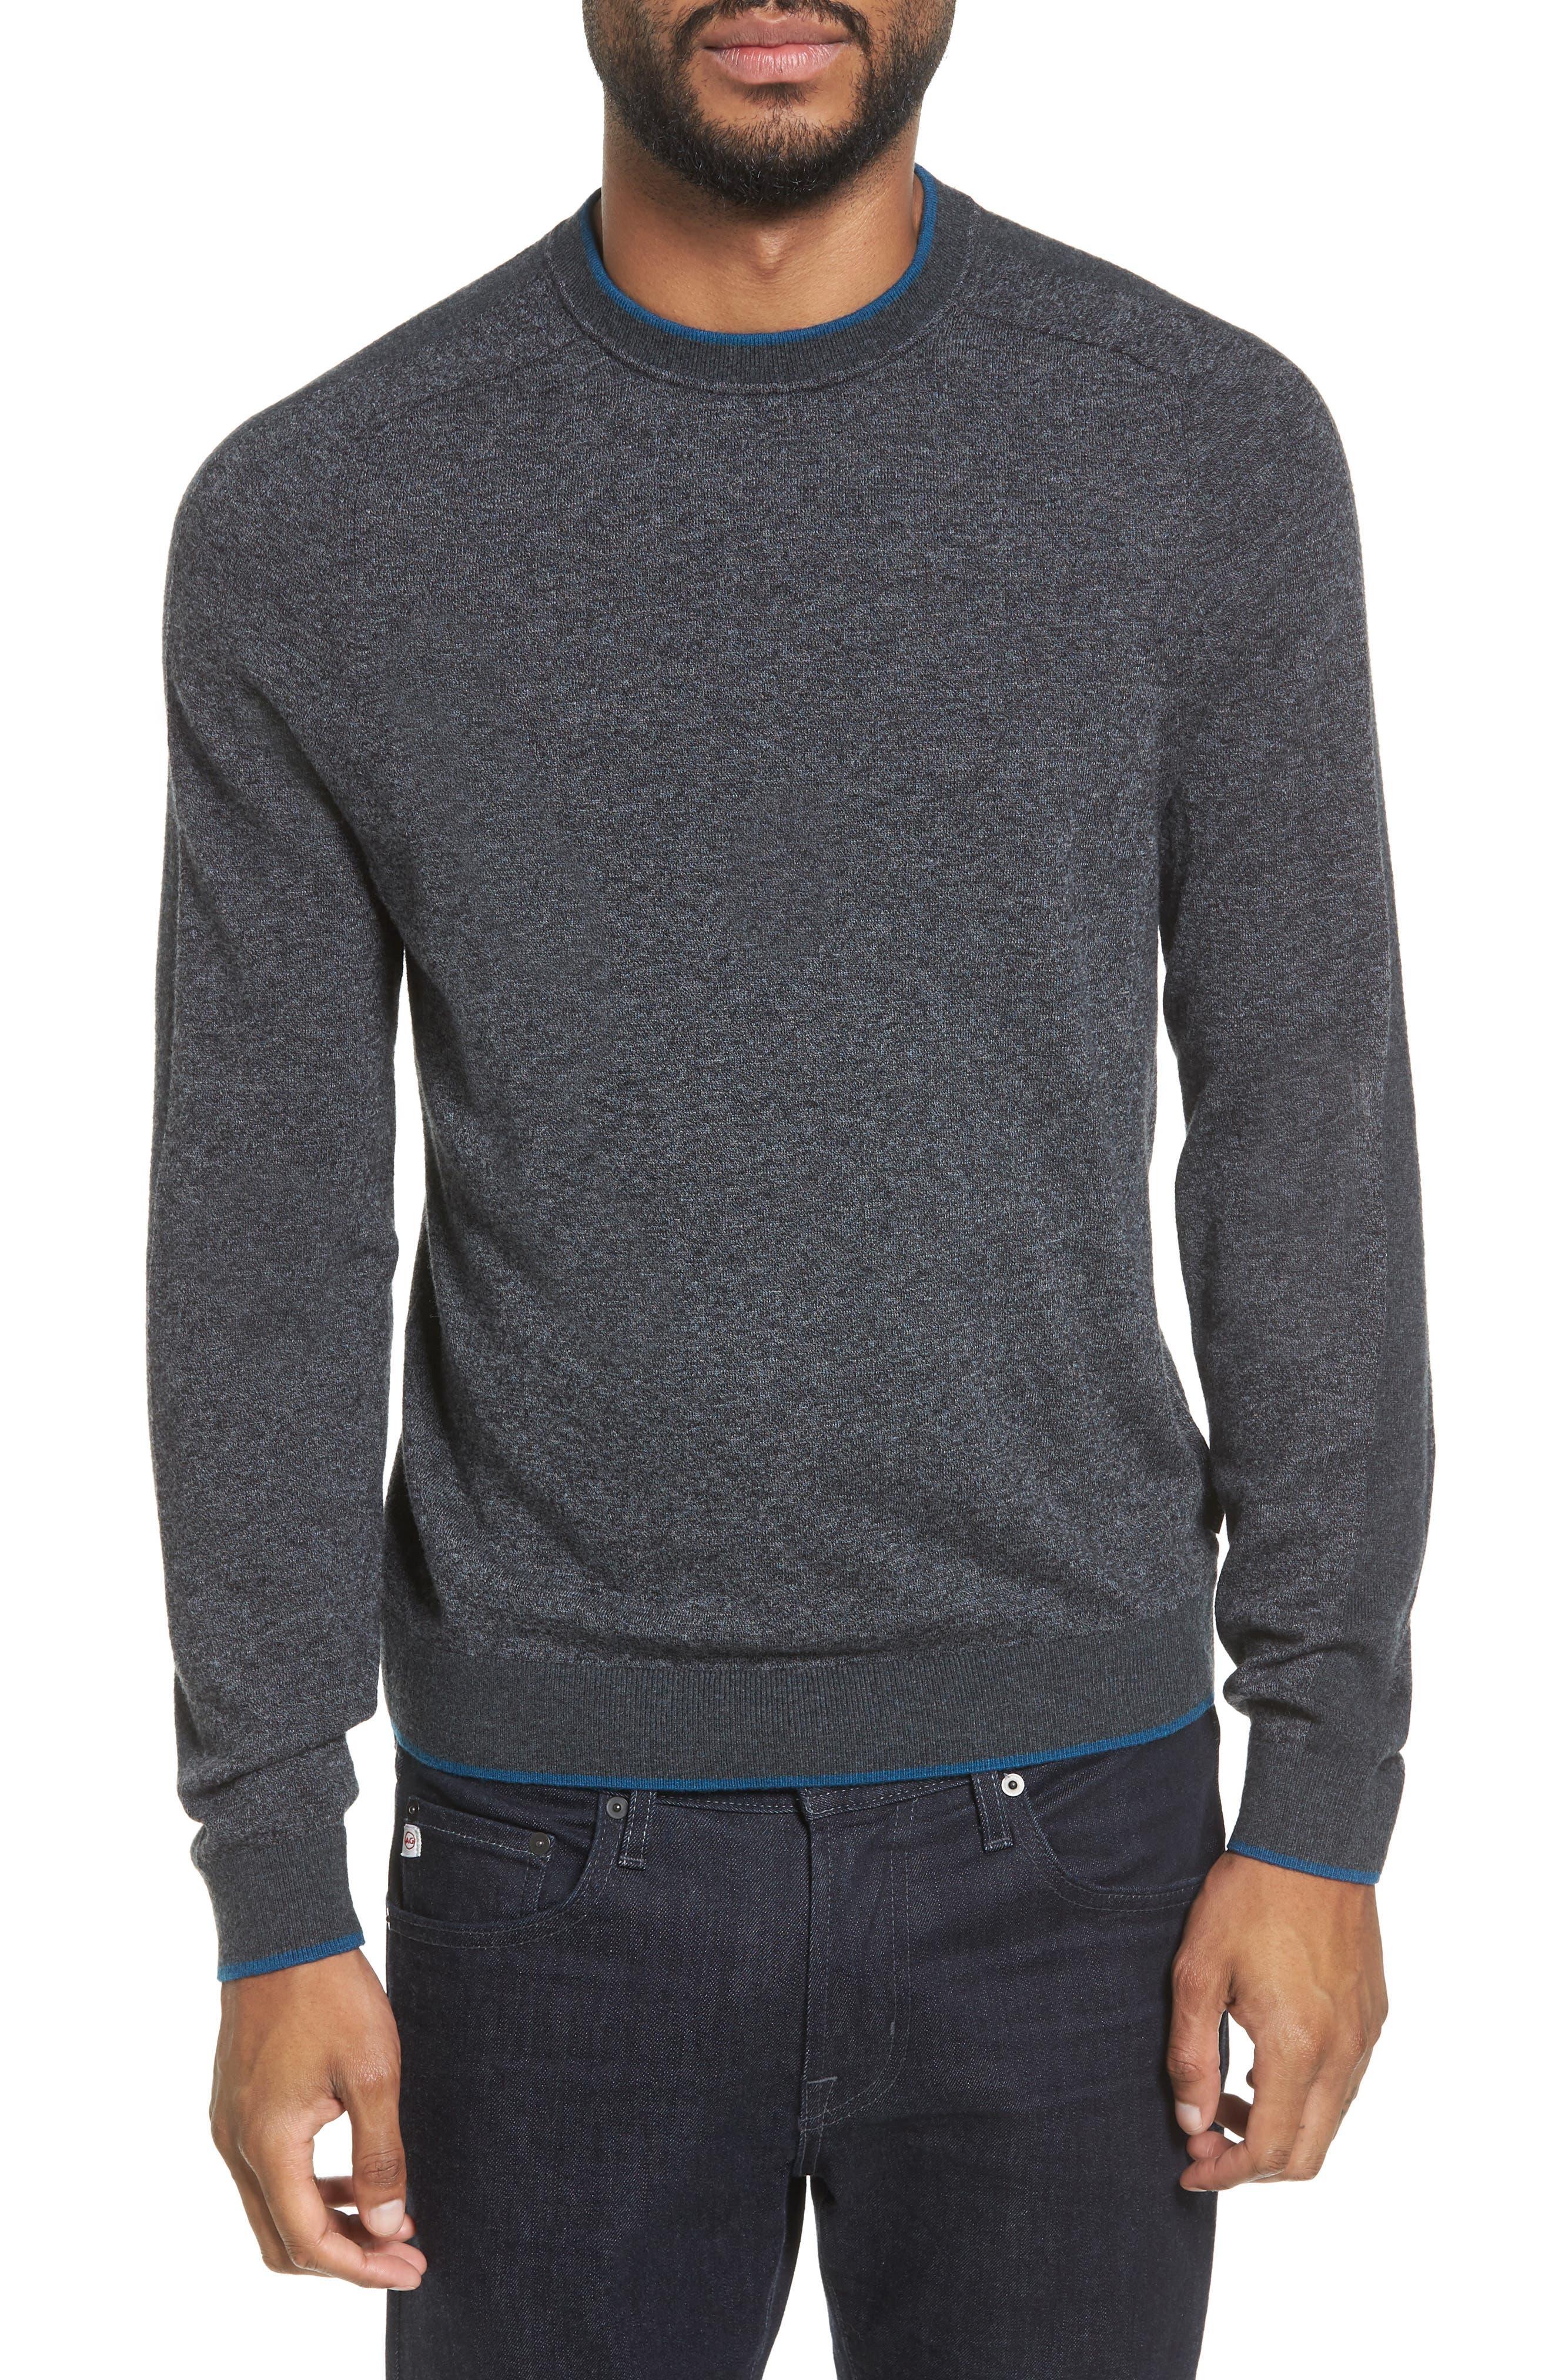 Norpol Crewneck Sweater,                             Main thumbnail 1, color,                             010